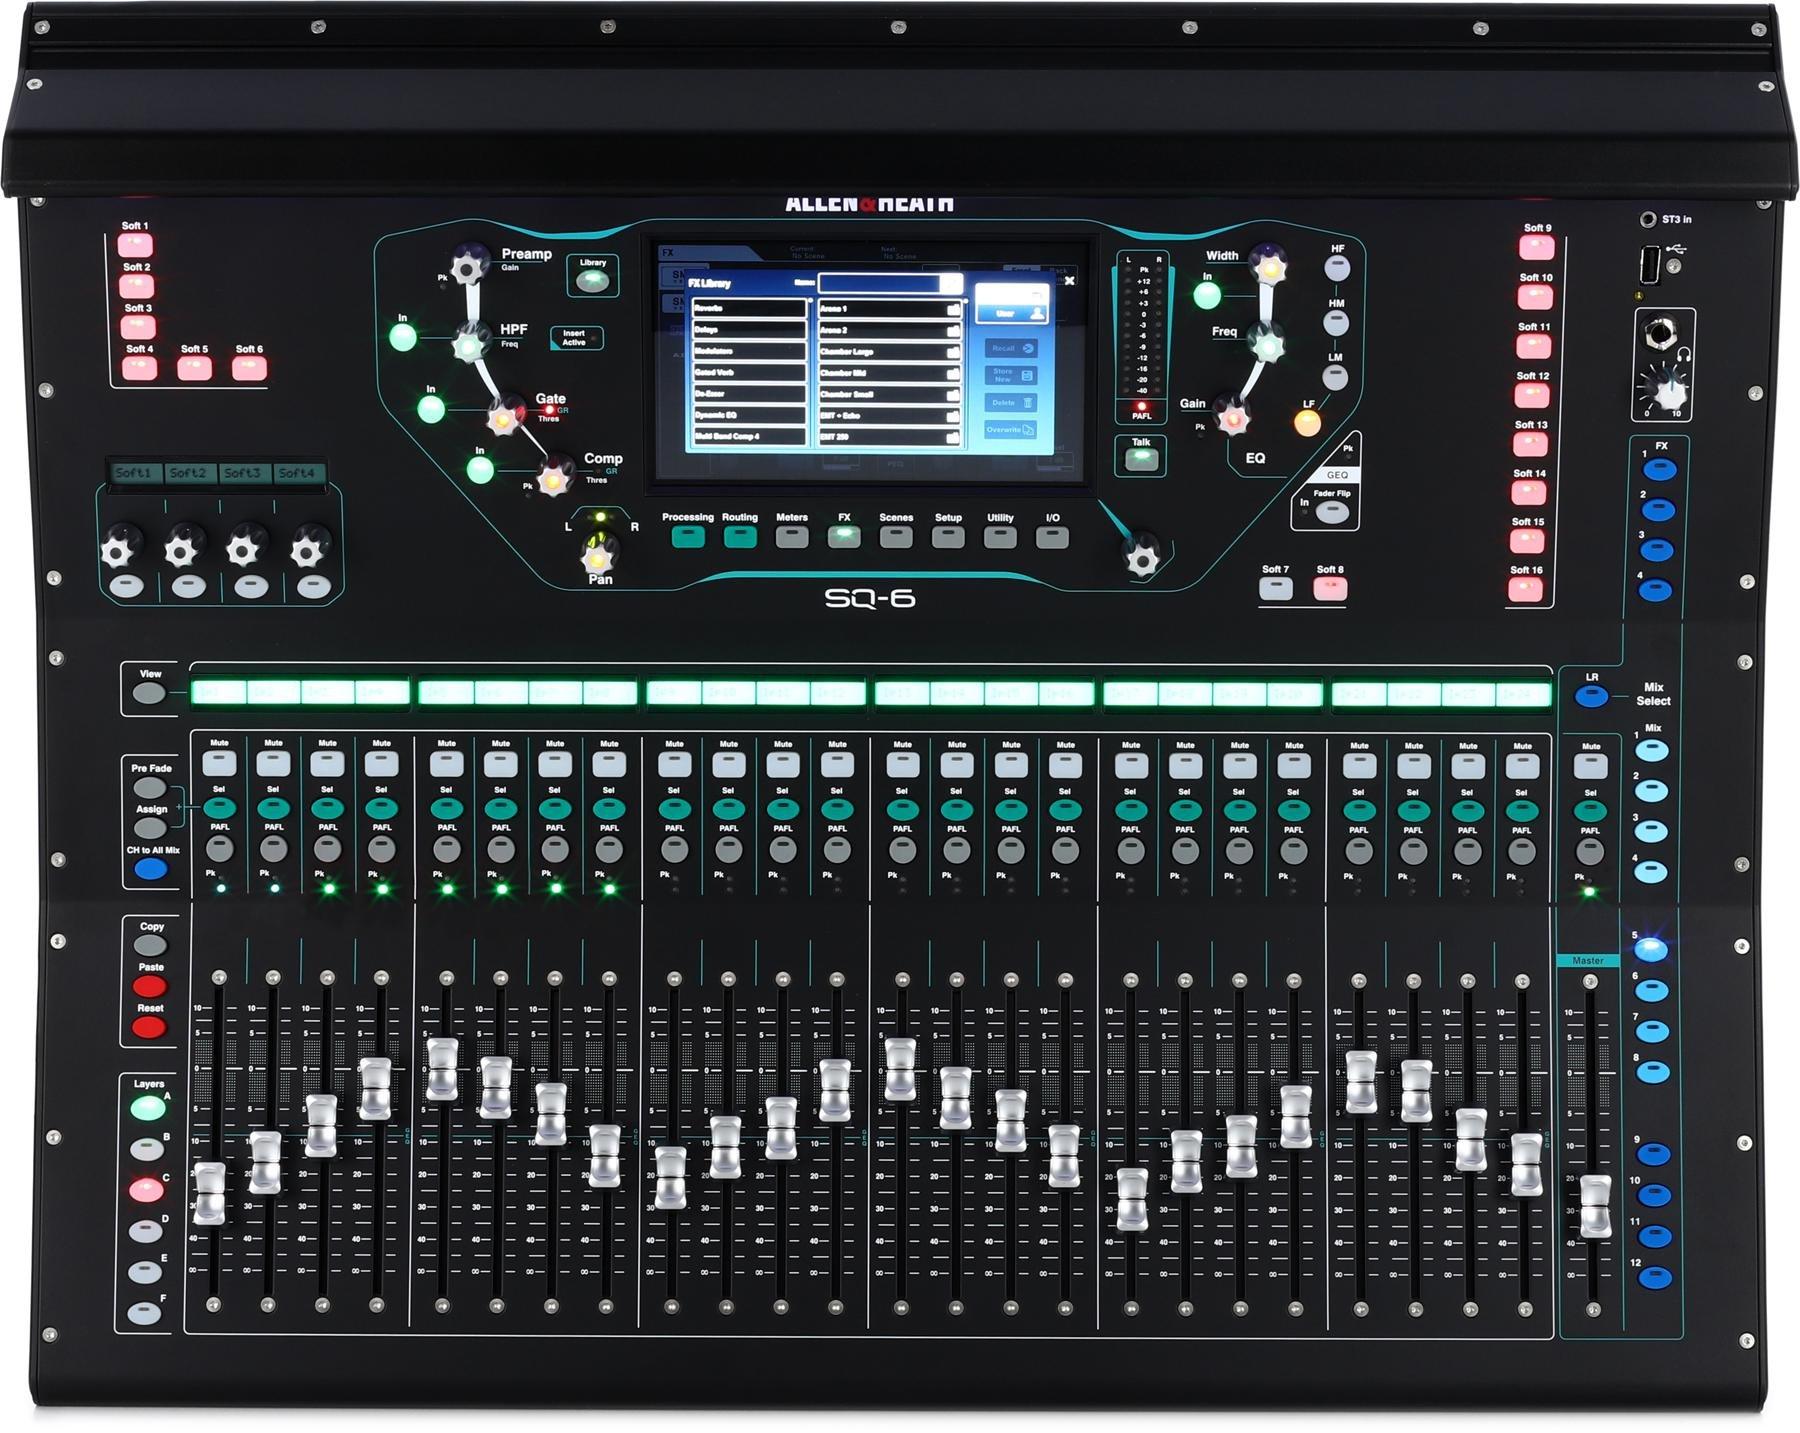 Allen Heath Sq 6 Digital Mixer Sweetwater Cable Neutrik Xlr 1 4quot Combo Jacks And Phantom Power Sound Design Image